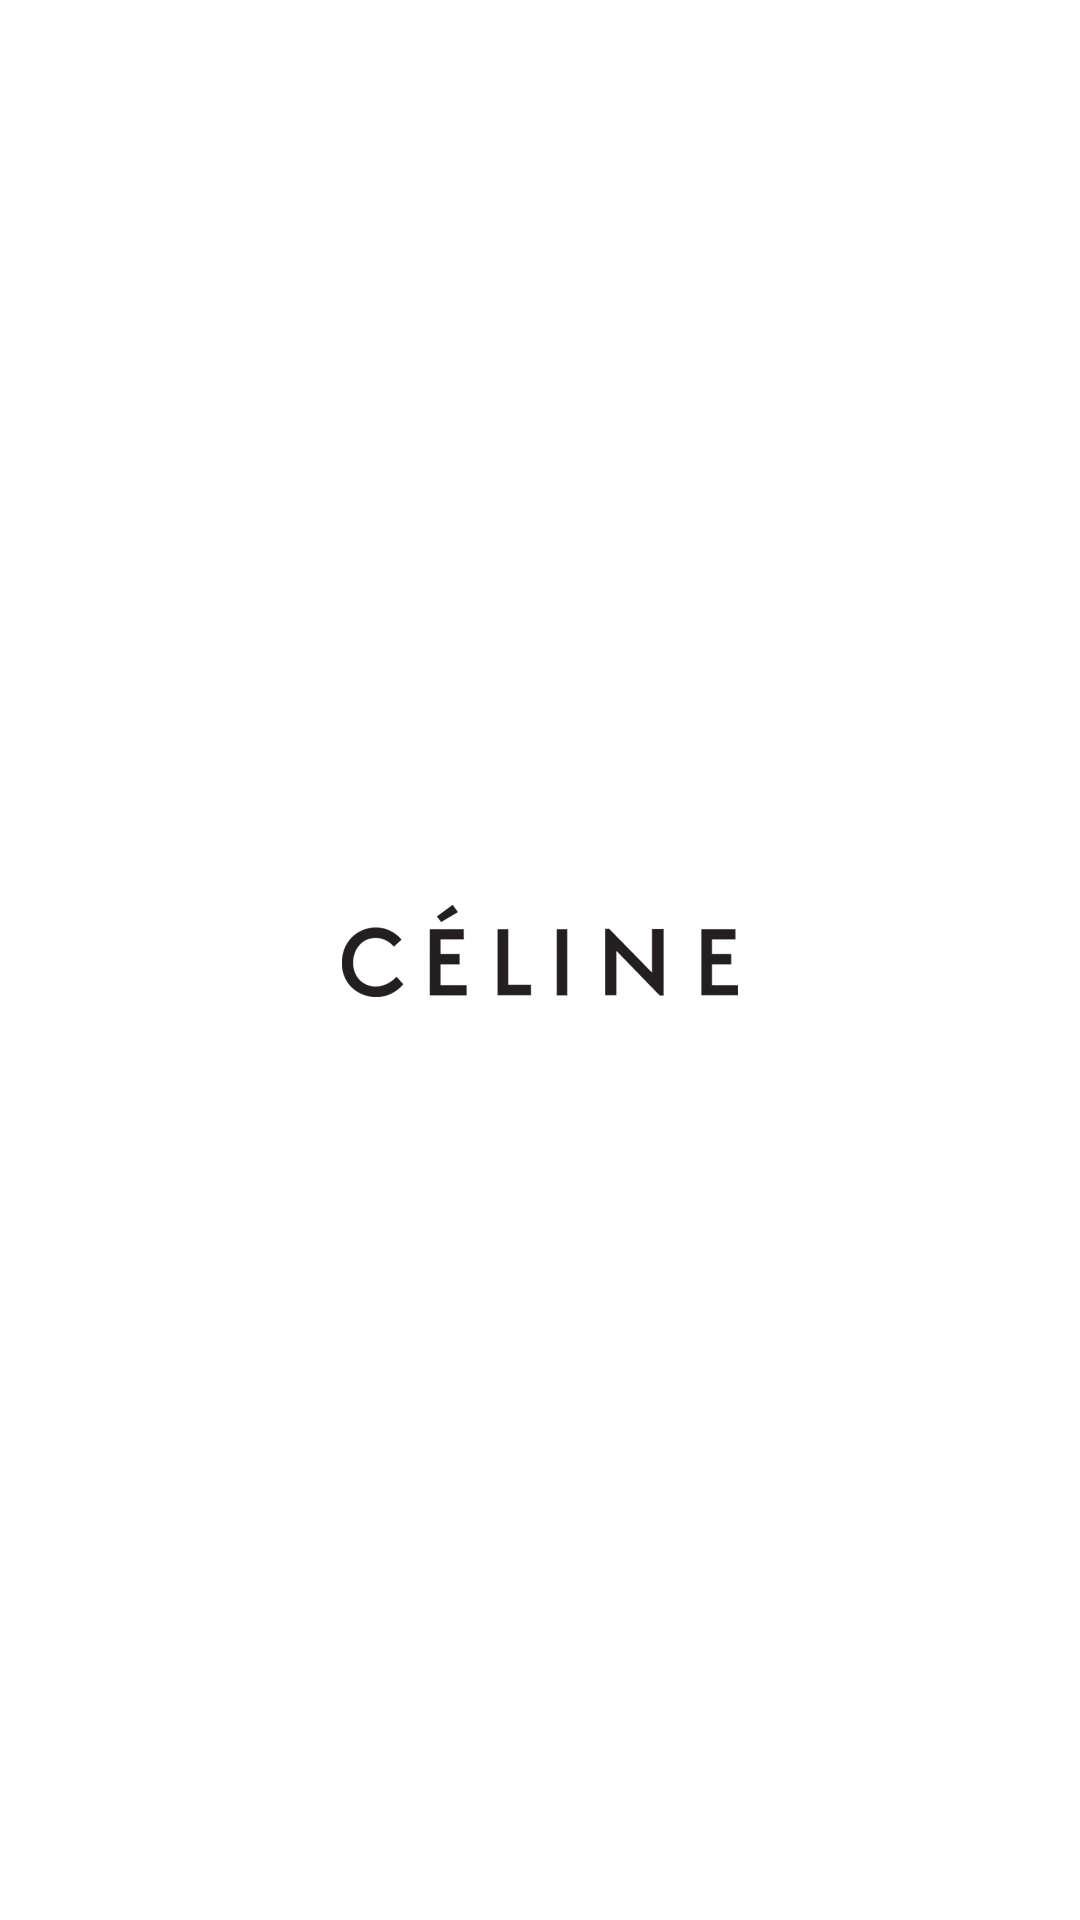 celine01